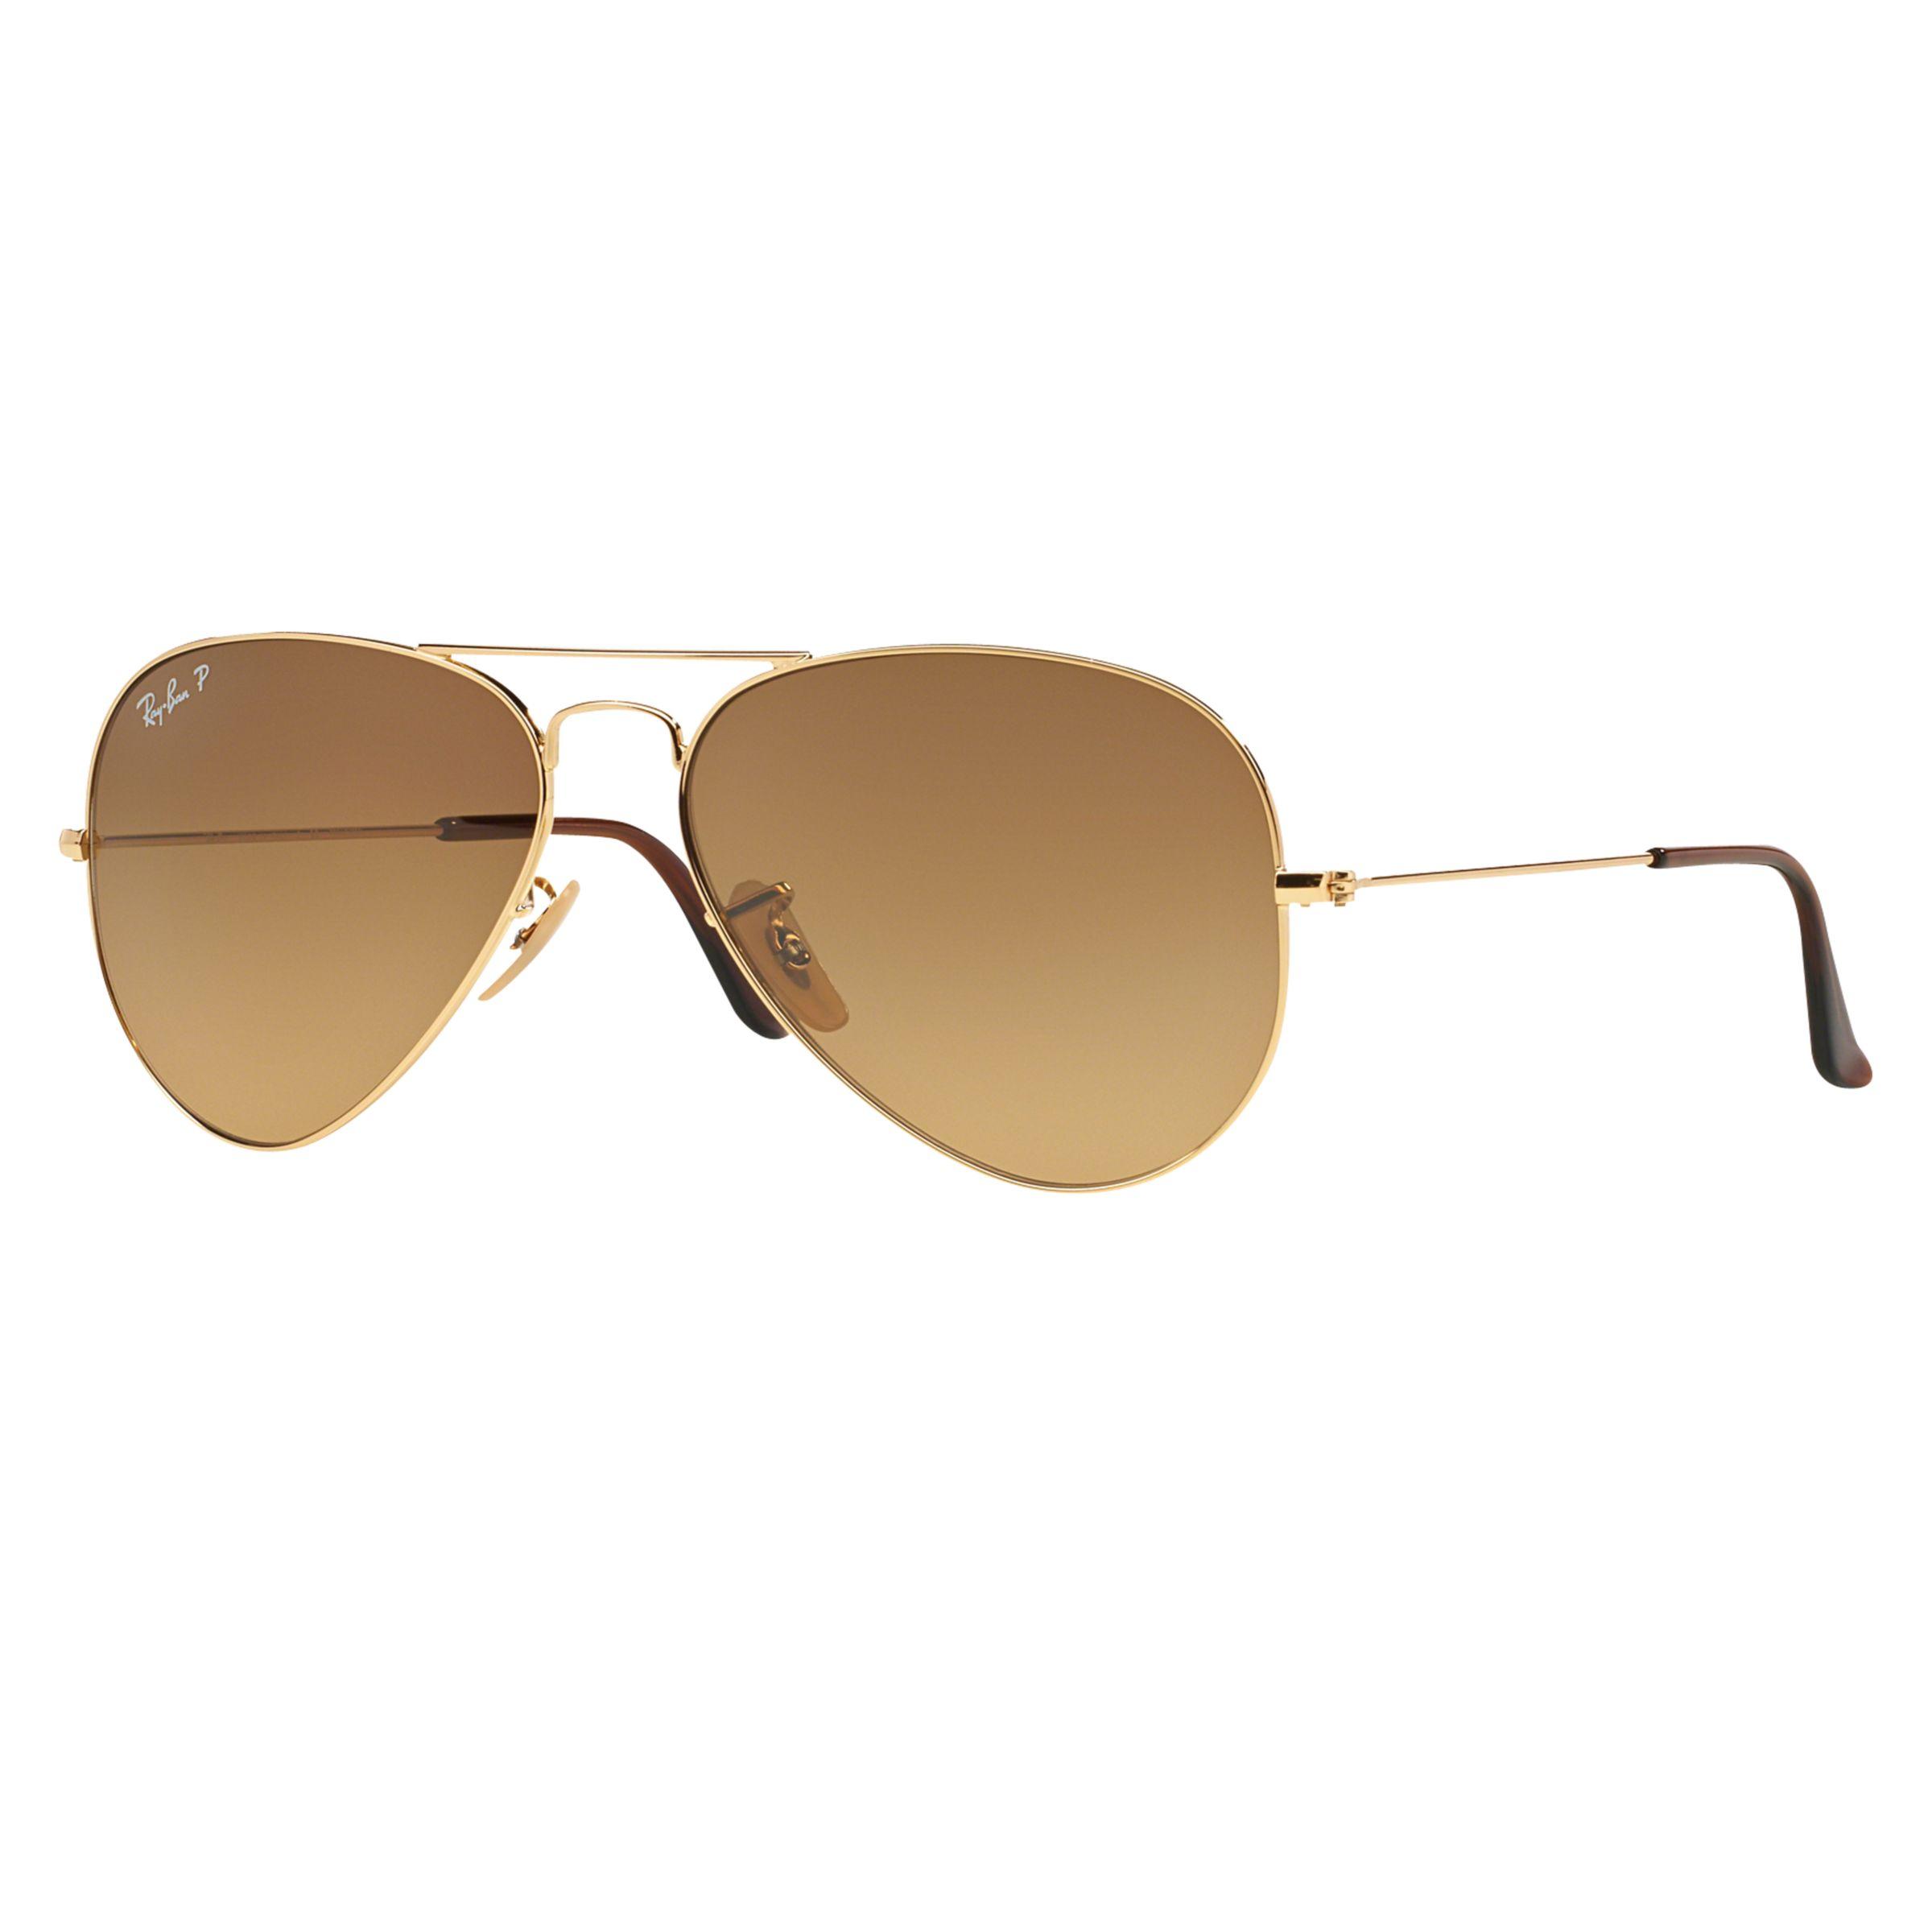 af7649636c Ray-Ban RB3025 Polarised Aviator Sunglasses